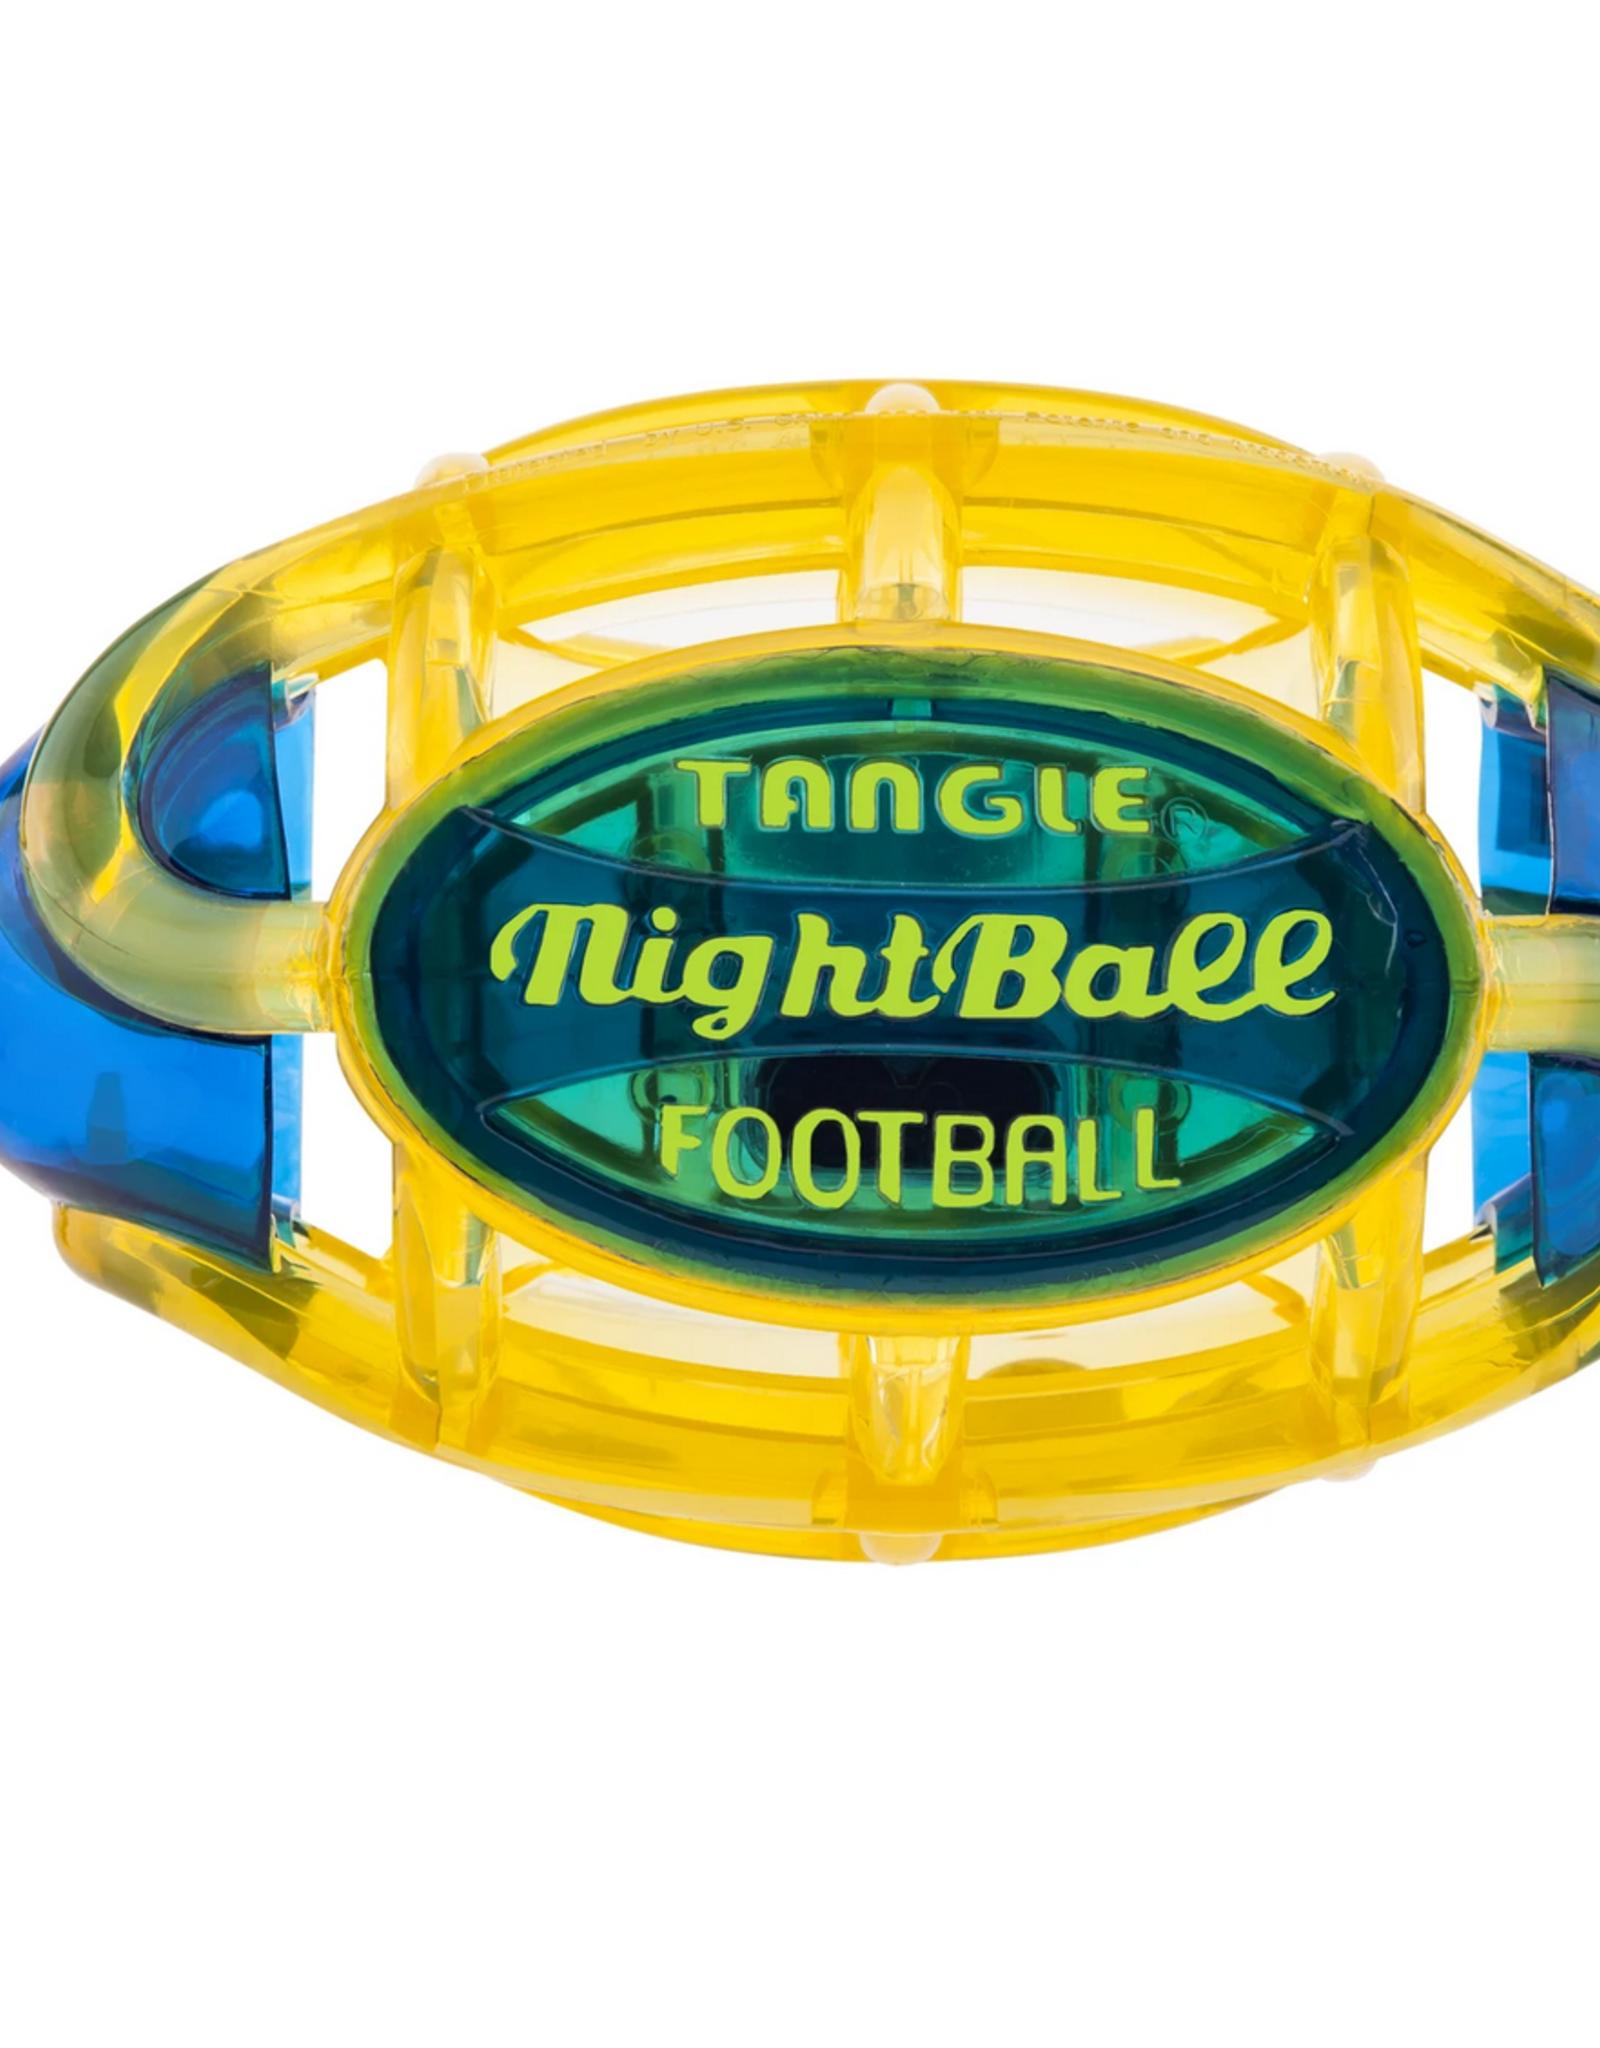 Tangle Nightball Football - Small Y/B